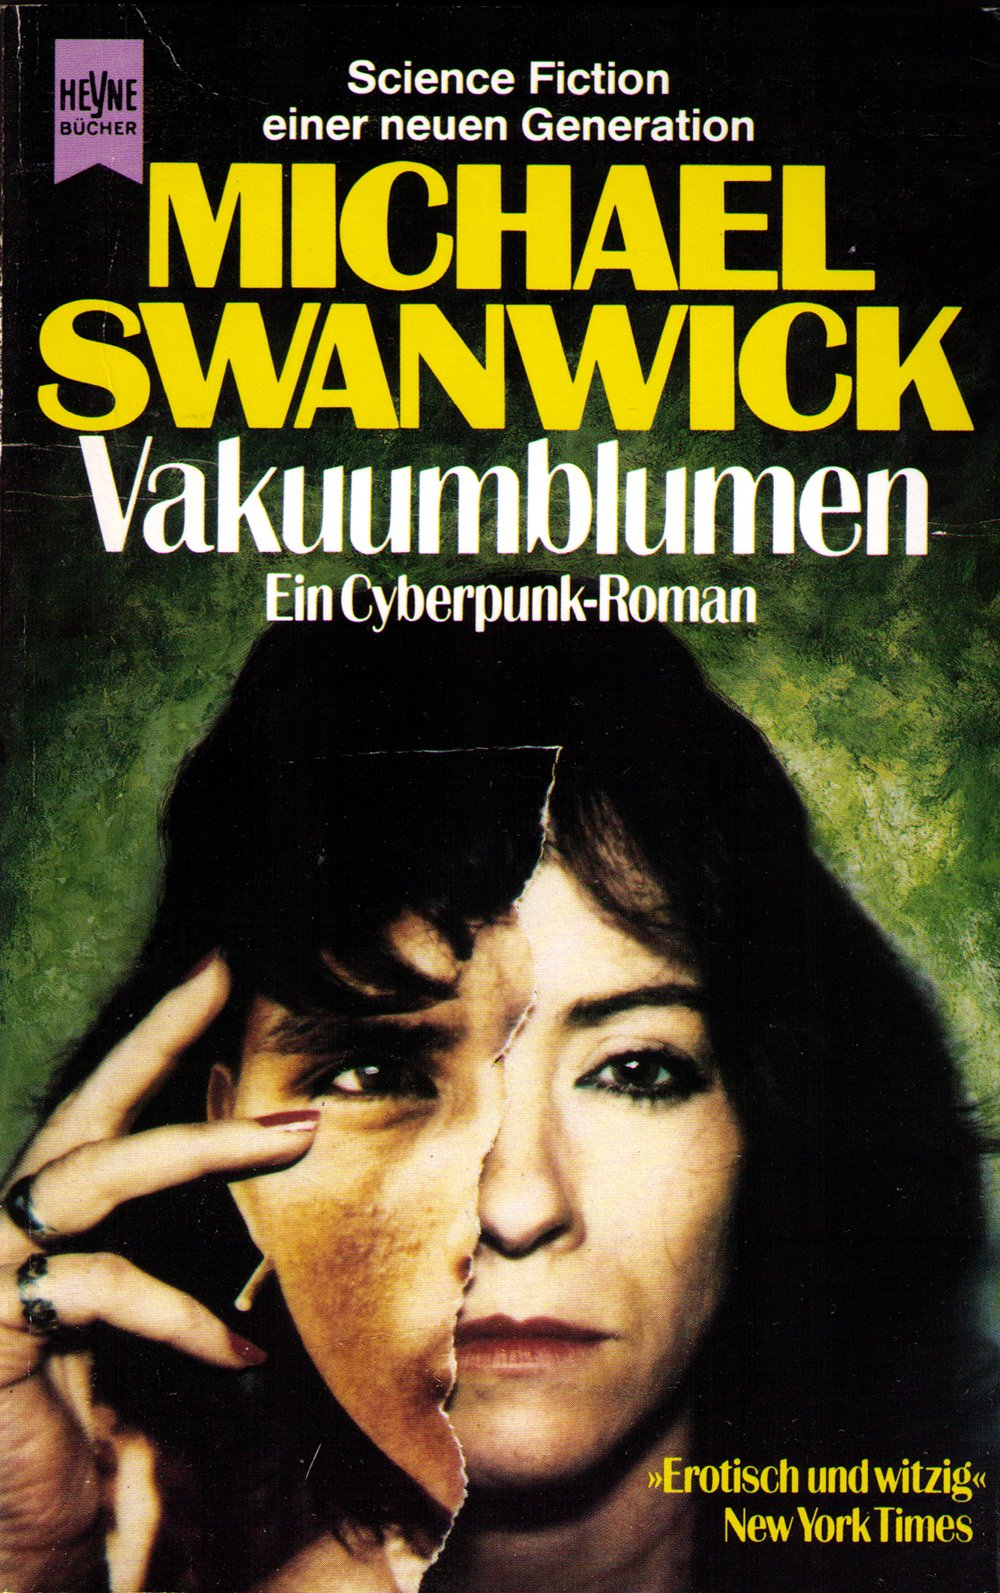 Michael Swanwick - Vakuumblumen. Cyberpunk-Roman